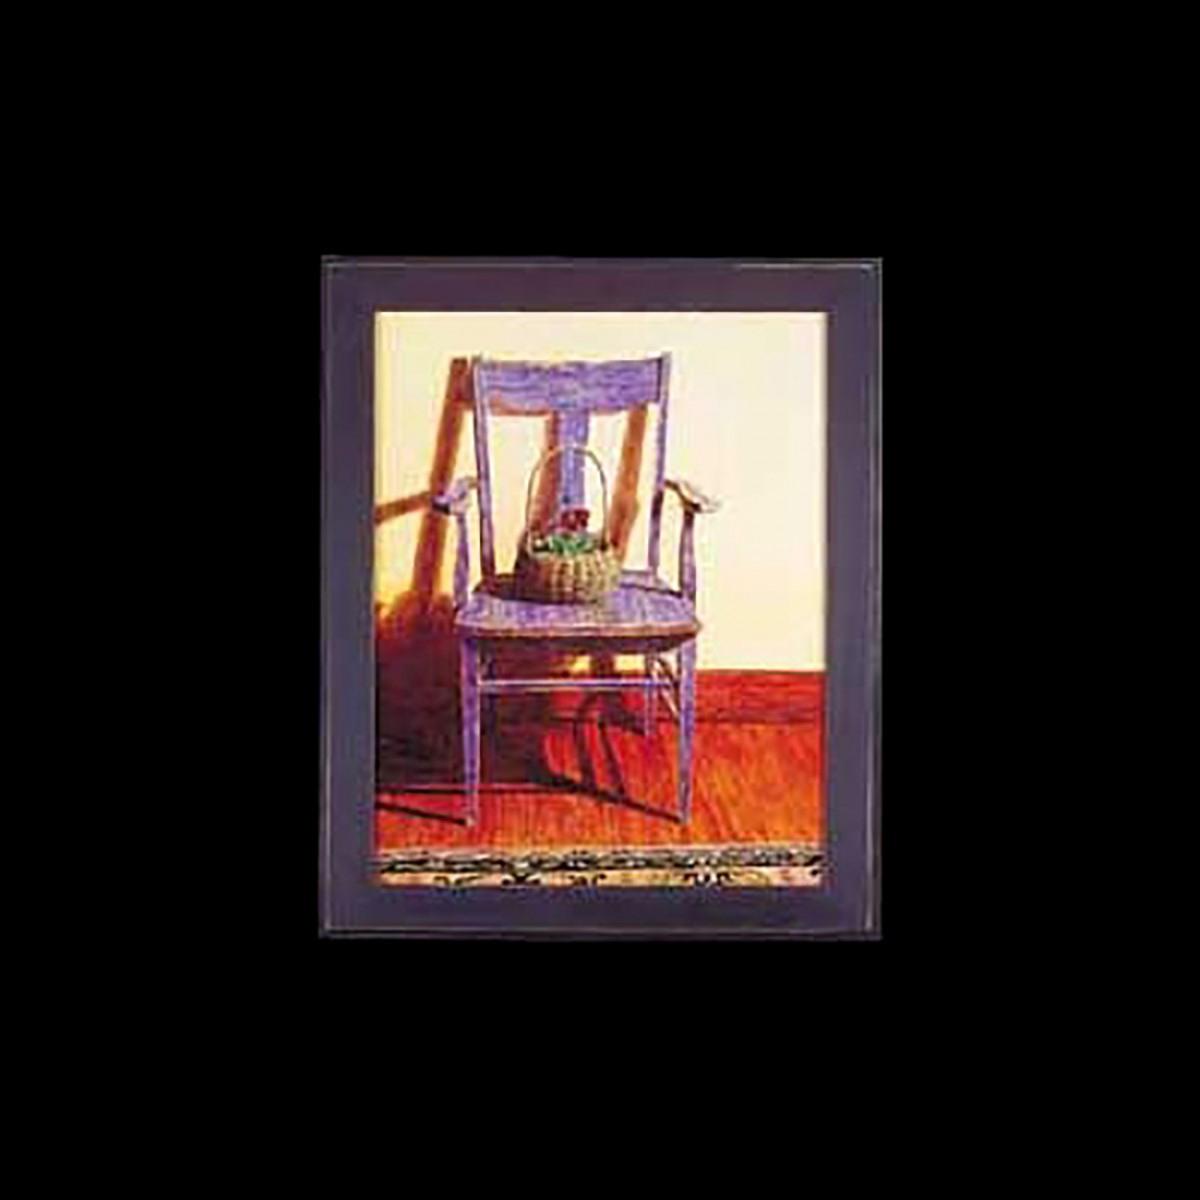 Framed Print Blue Chair 24 x 29.5 Wall Art Wall Prints Framed Art Decoratvie Framed Art